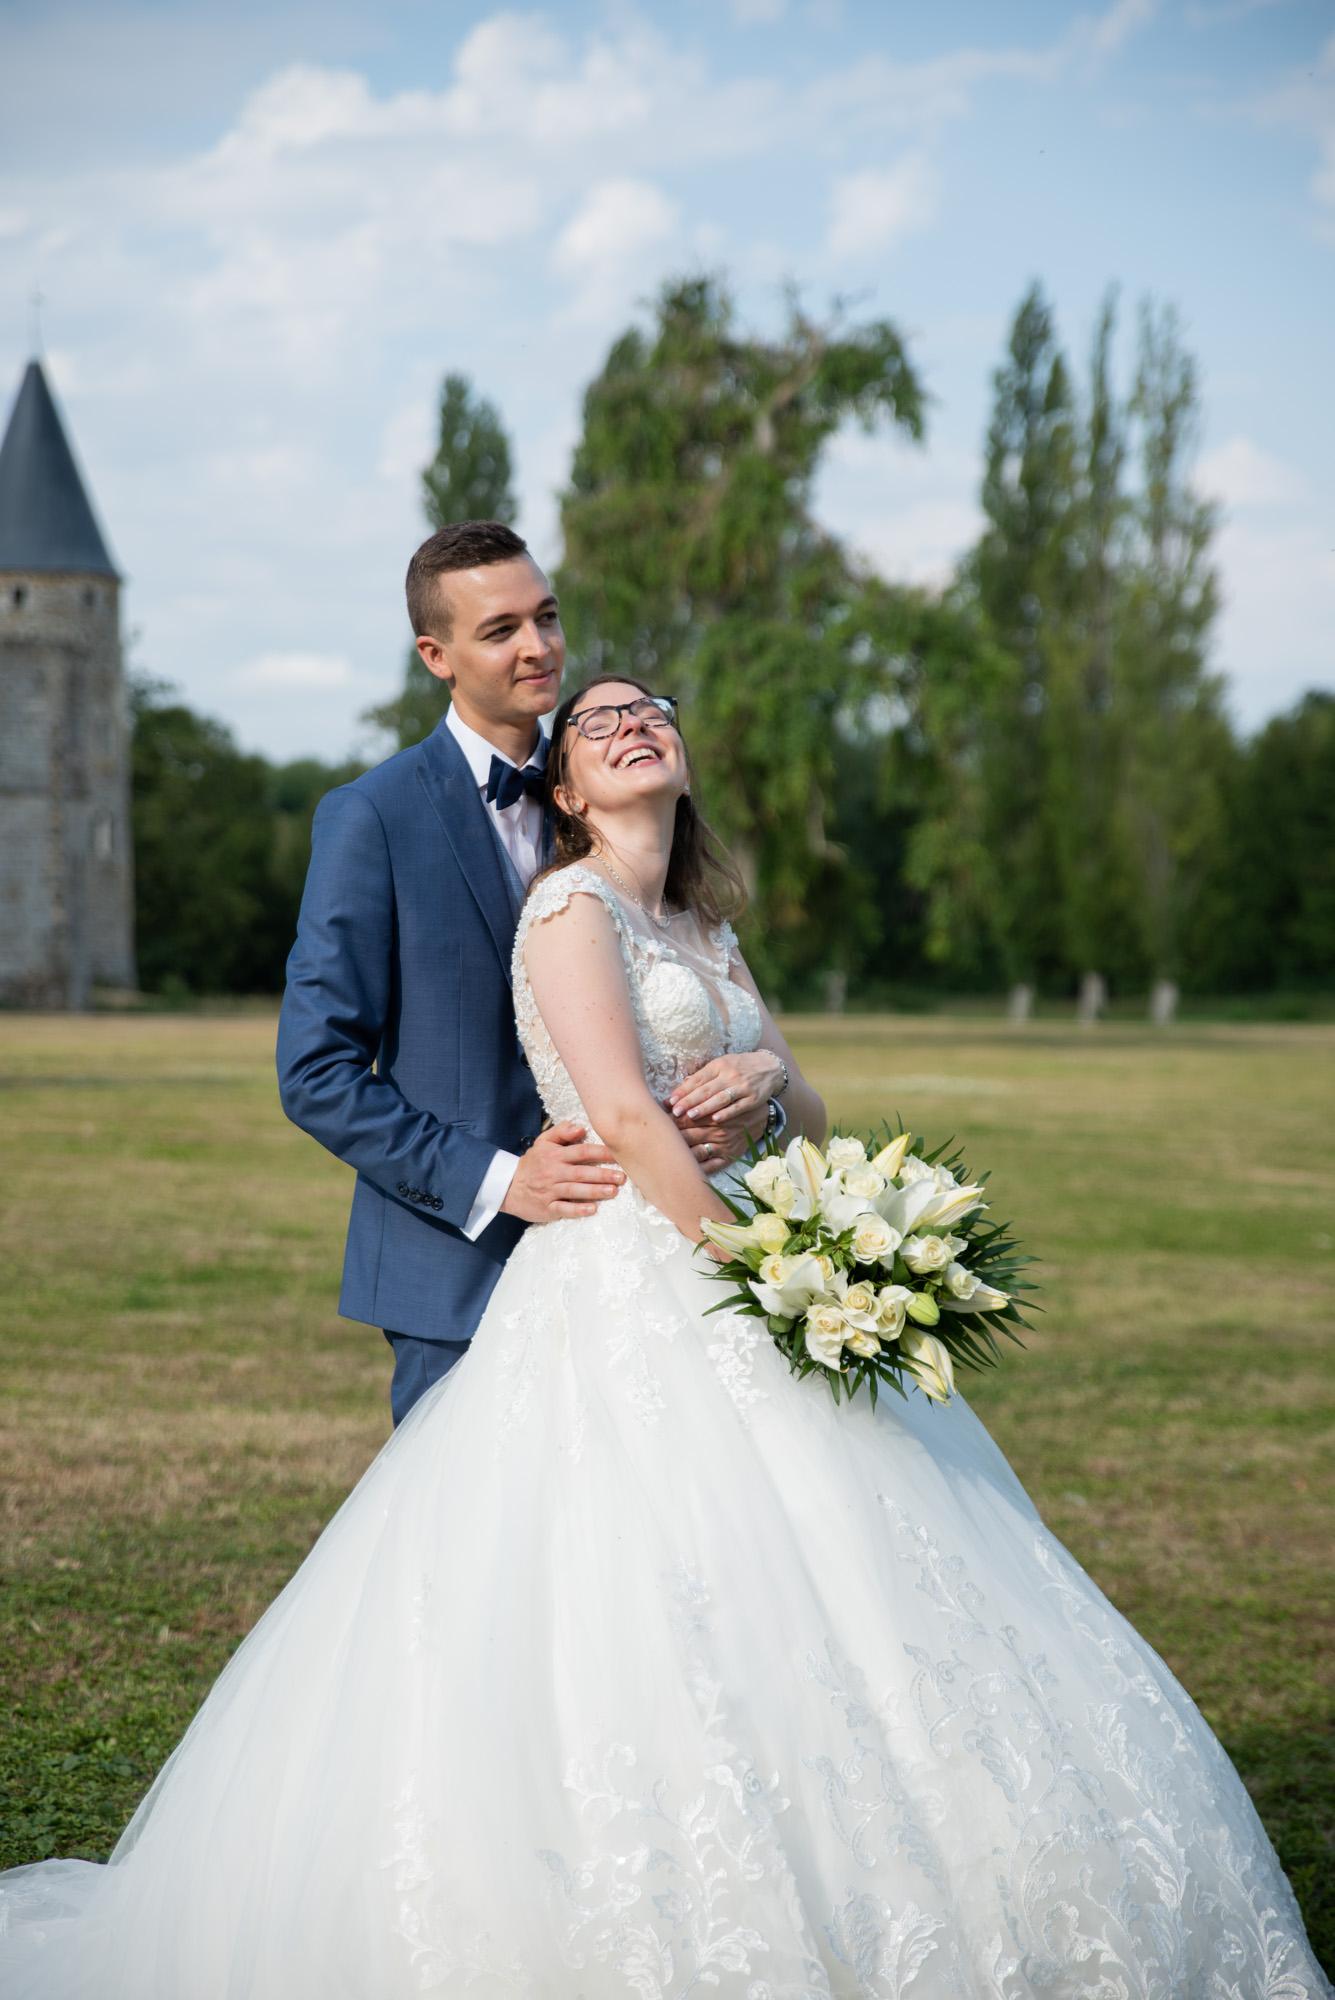 Tarif photographe de mariage professionnel